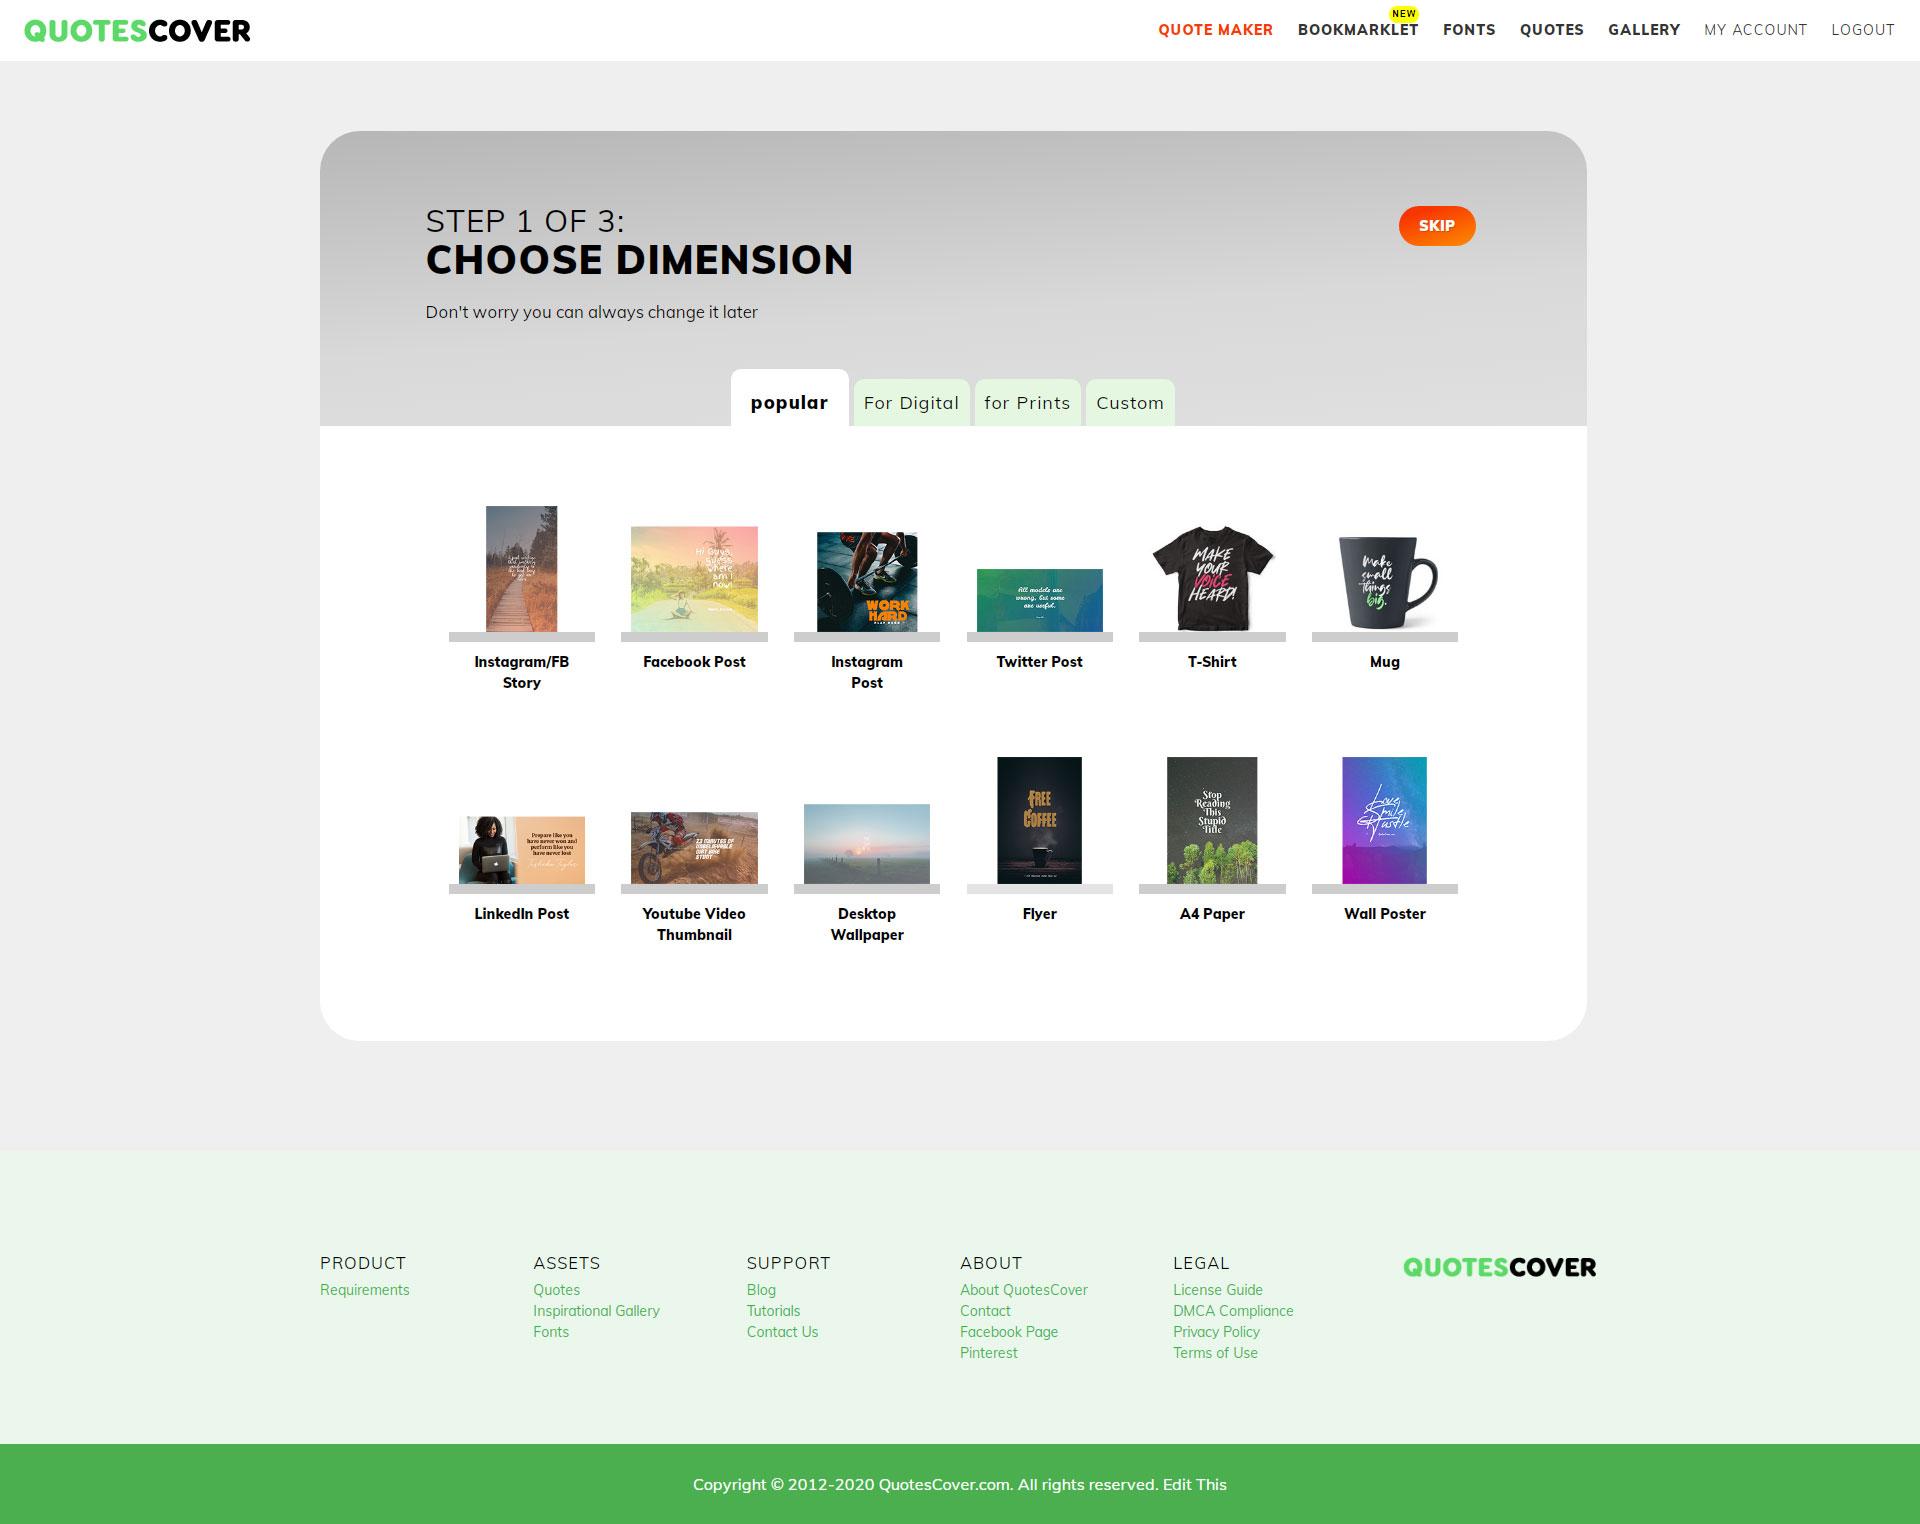 Members Page Screenshot: Step 1. Choose Dimension